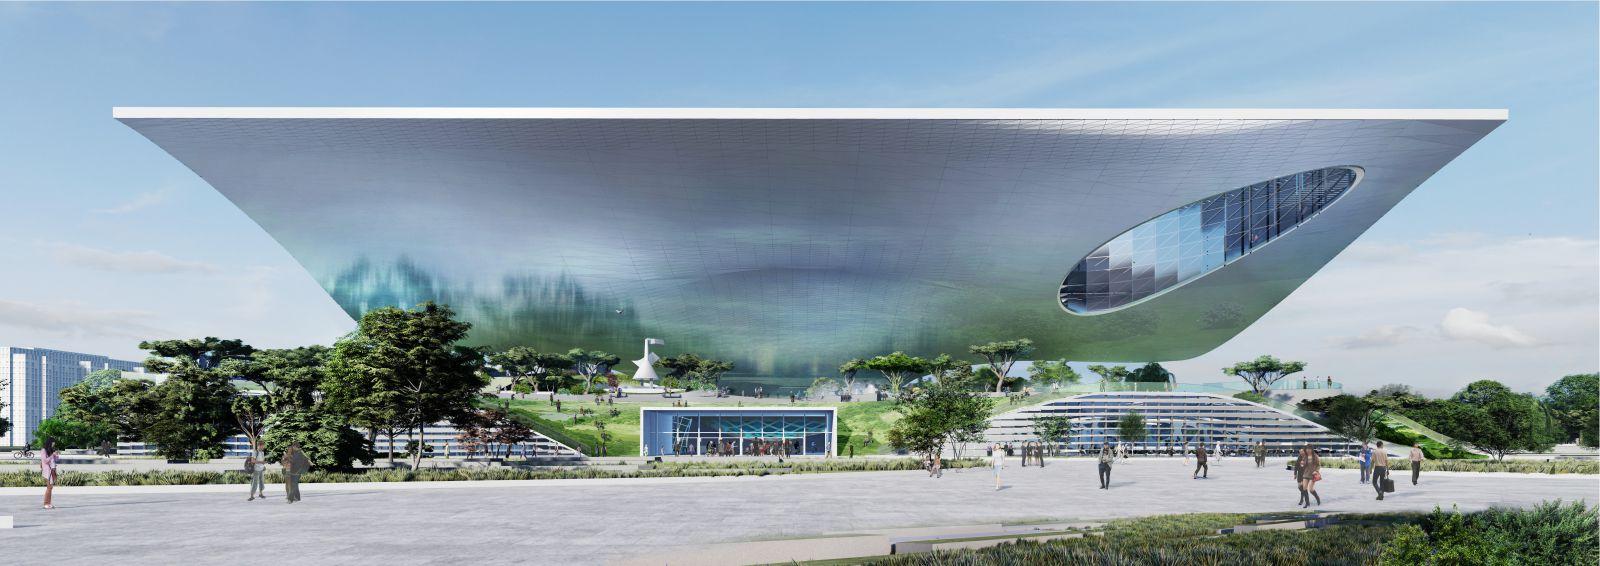 Museum Xingtai